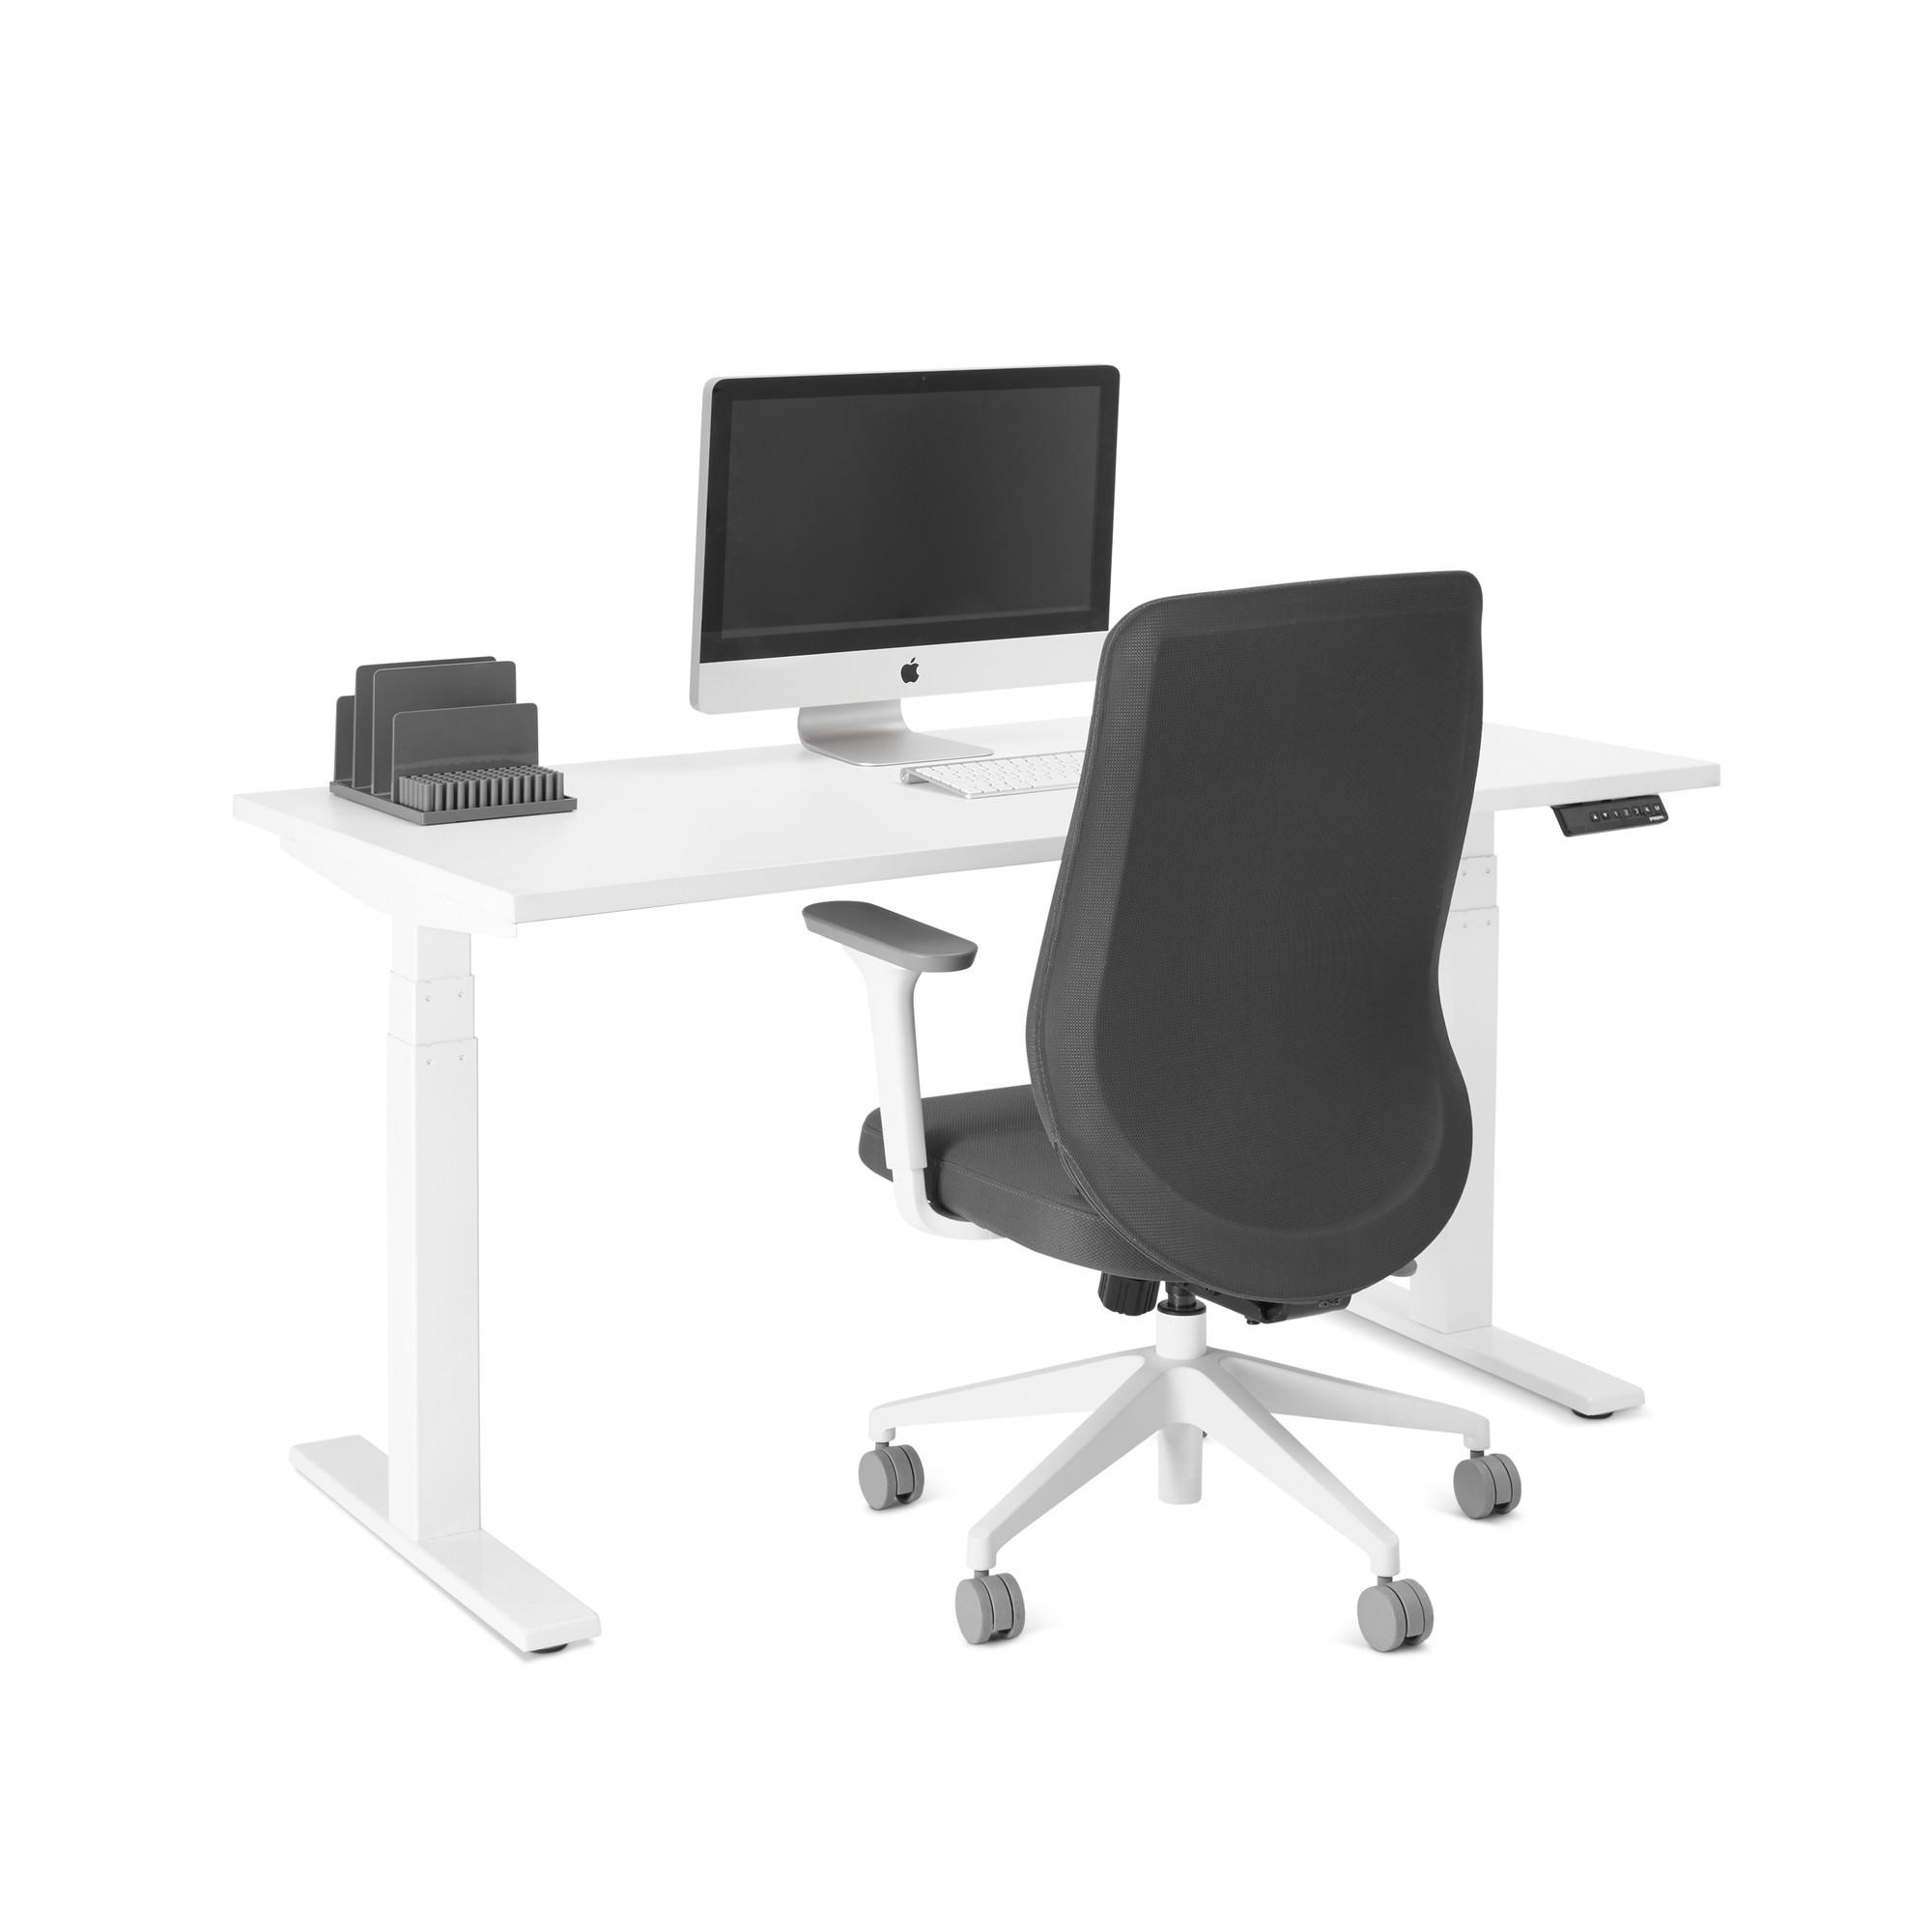 modern office furniture white inexpensive series adjustable height single desk white 57 modern office furniture poppin